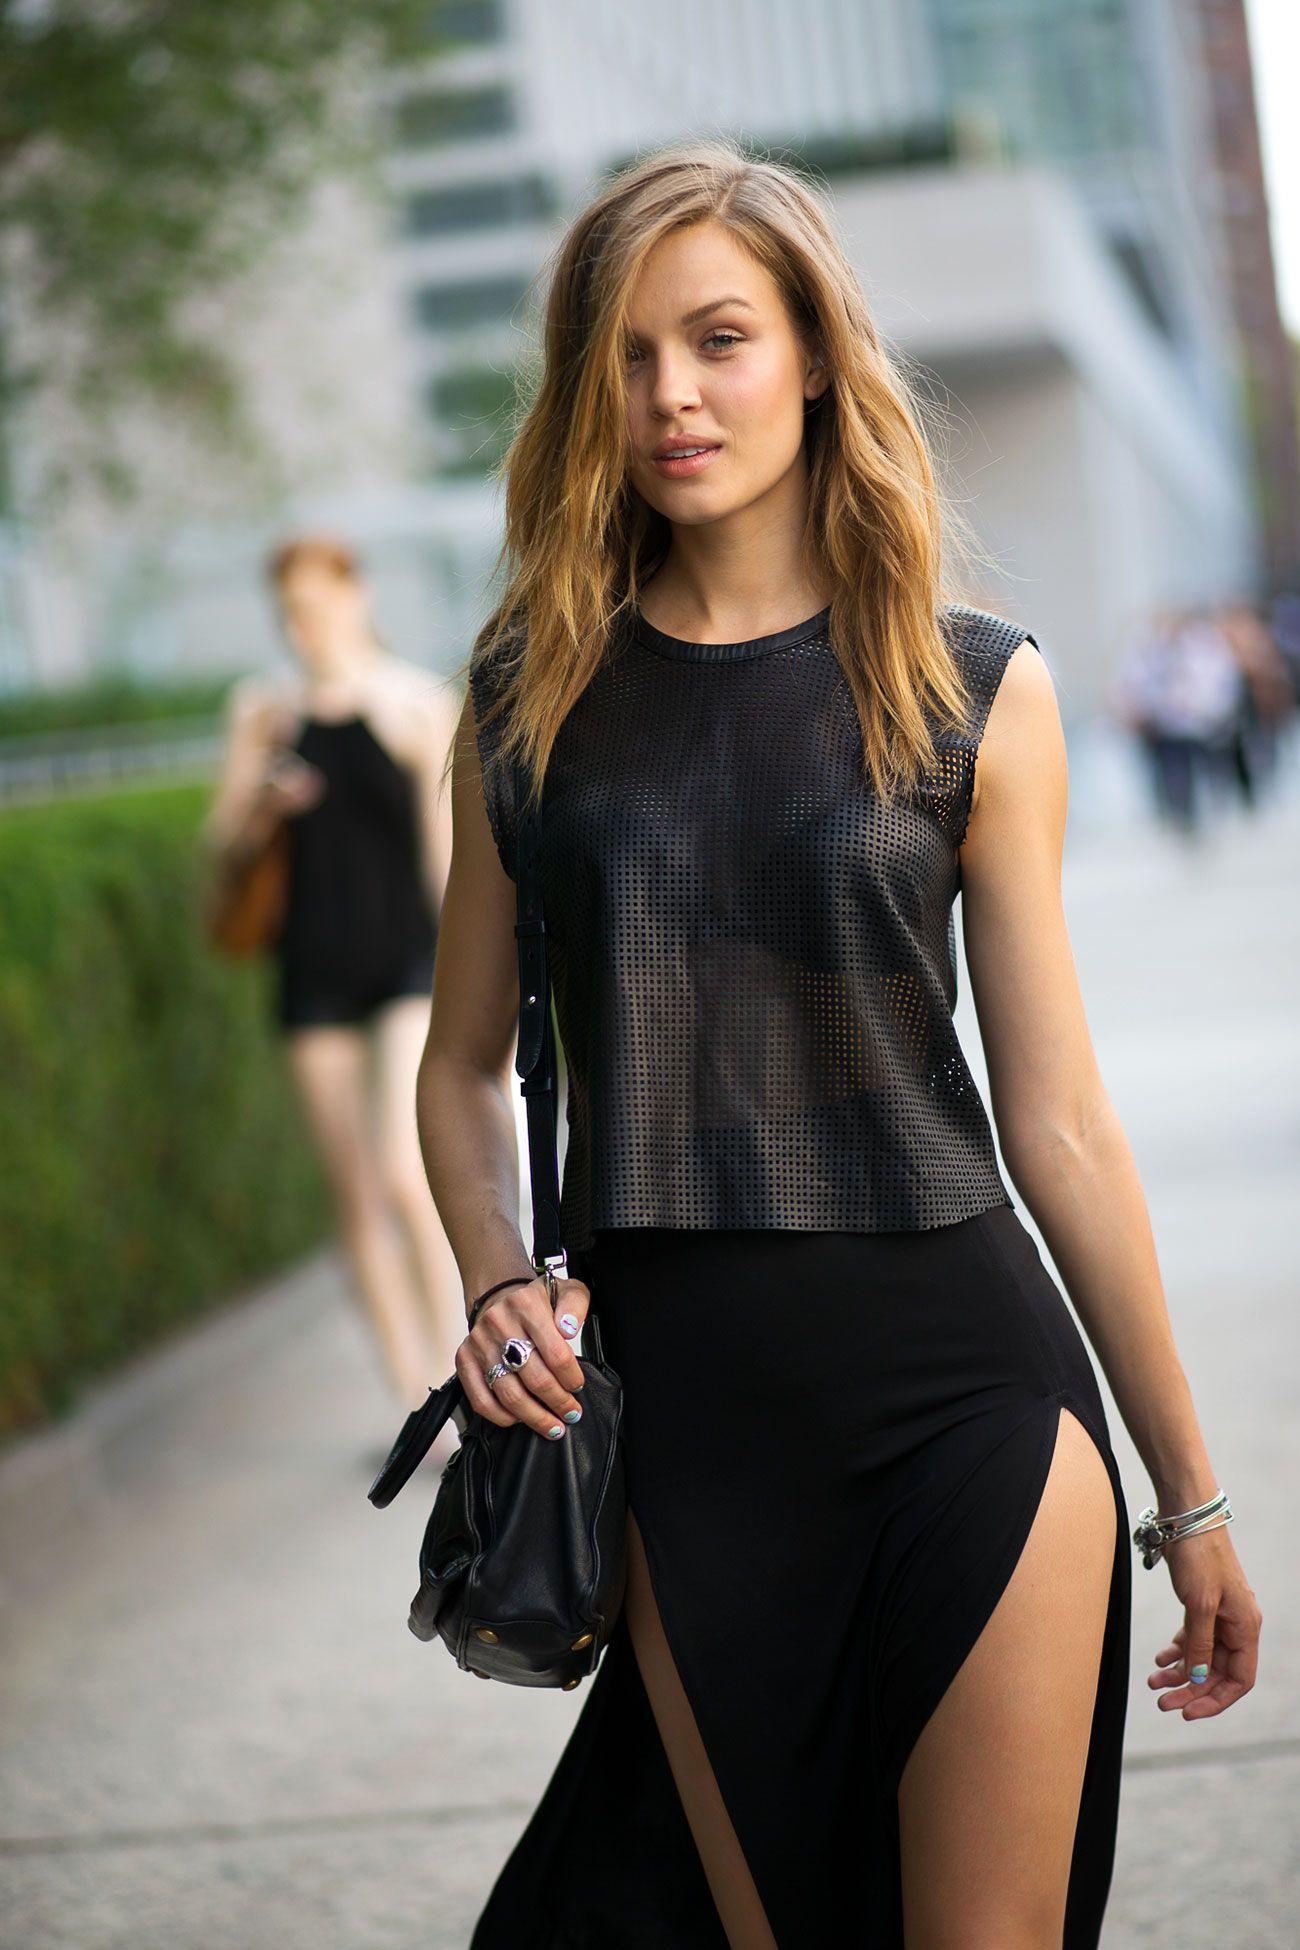 Hipster Fashion Women Fall 2014-2015 | Fashion Trends 2015 ... |New York Girl Clothing